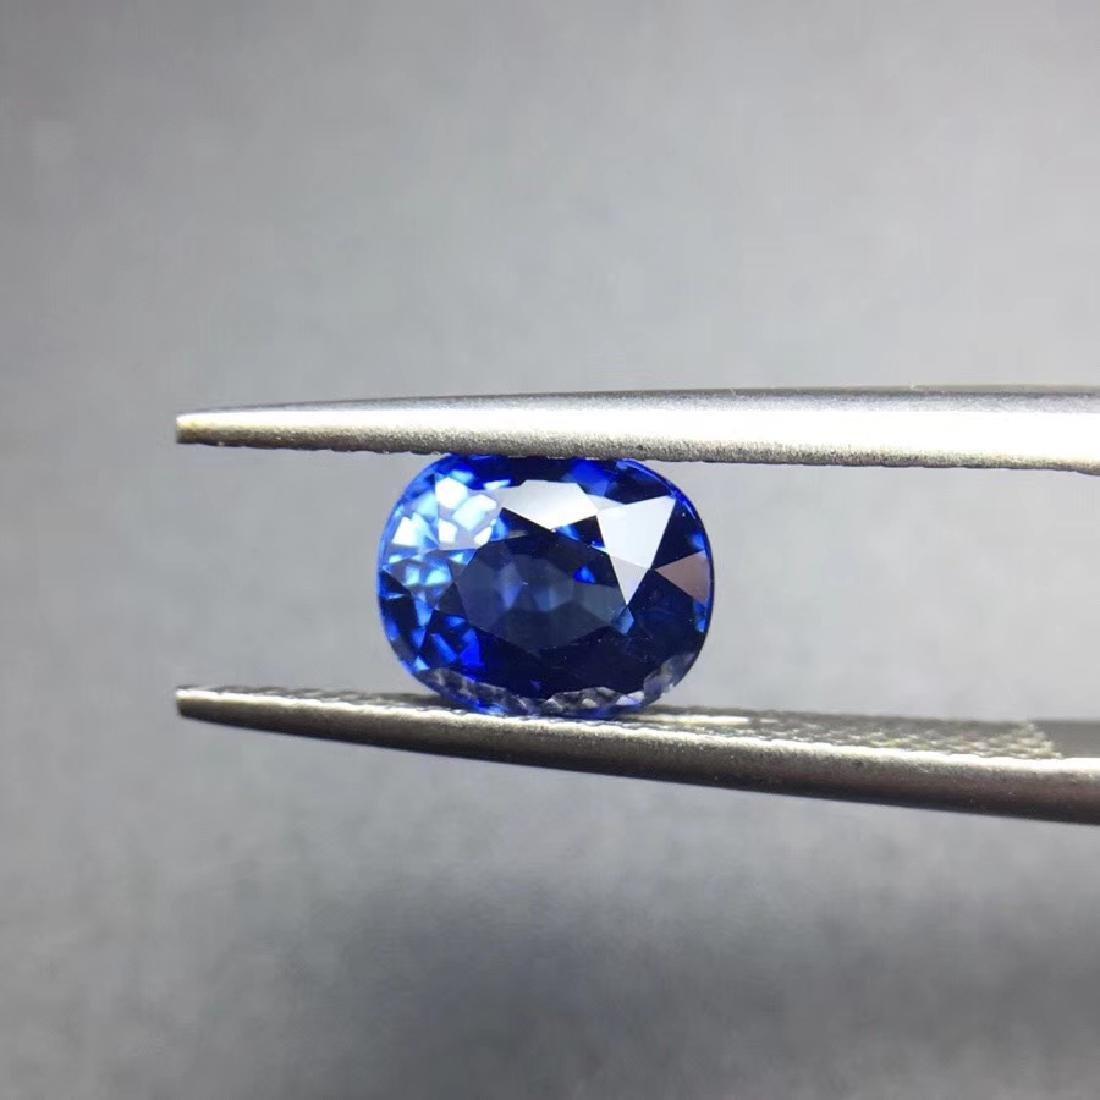 1.85 ct Sapphire 7.4*6.0*4.4 mm Oval Cut